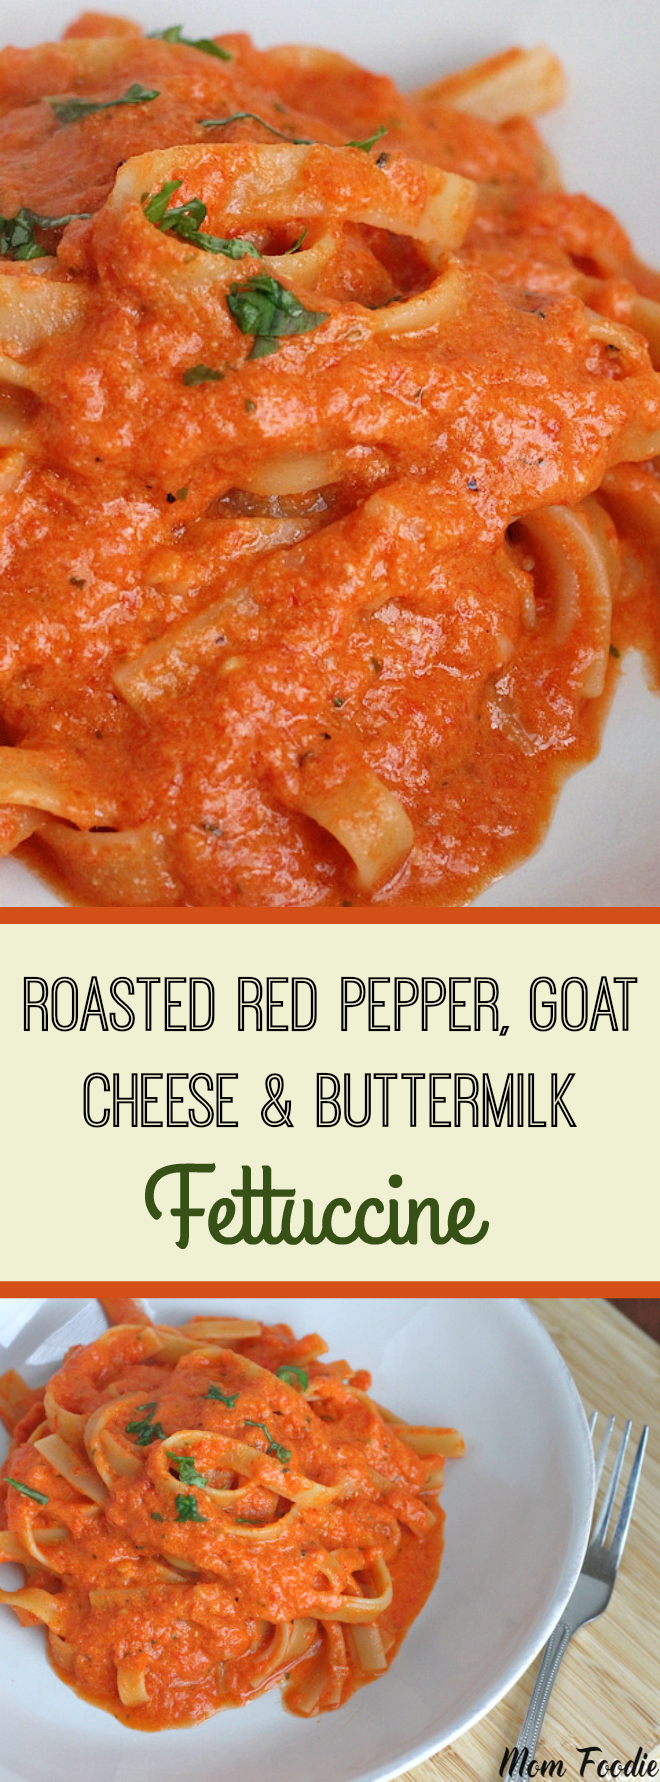 Roasted Red Pepper, Goat Cheese & Buttermilk Sauce Fettuccine